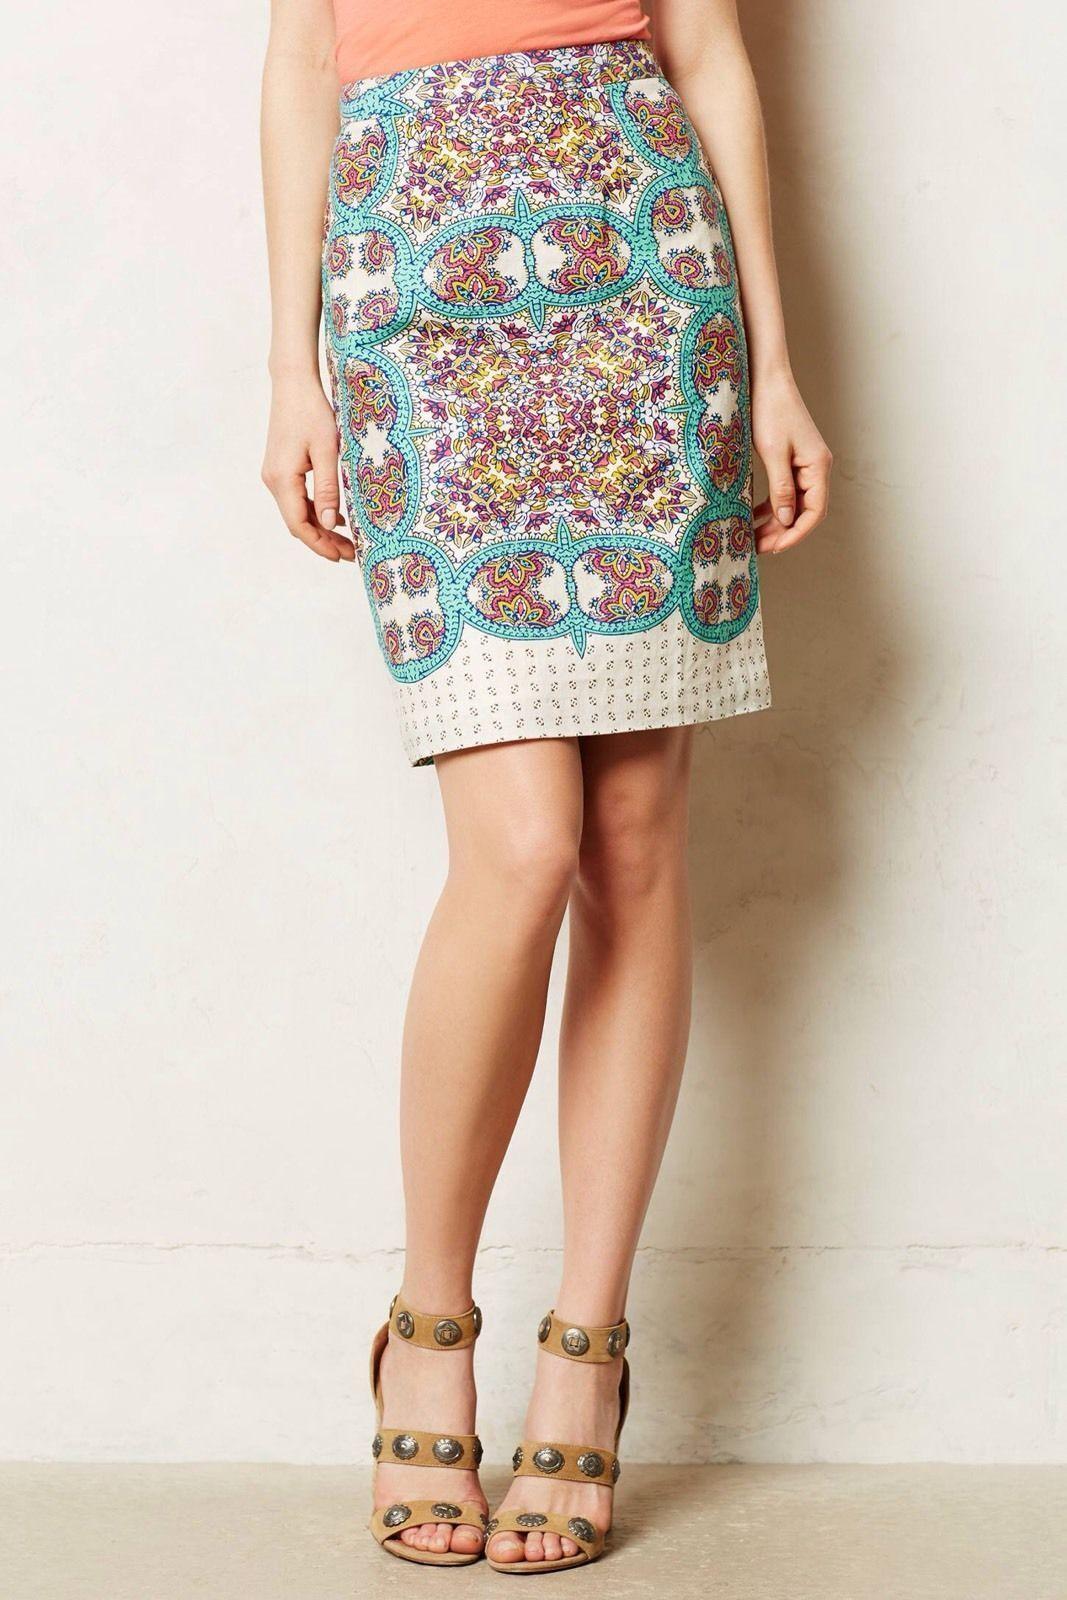 Anthropologie Maeve Manolya Linen Pencil Skirt 8 NWT